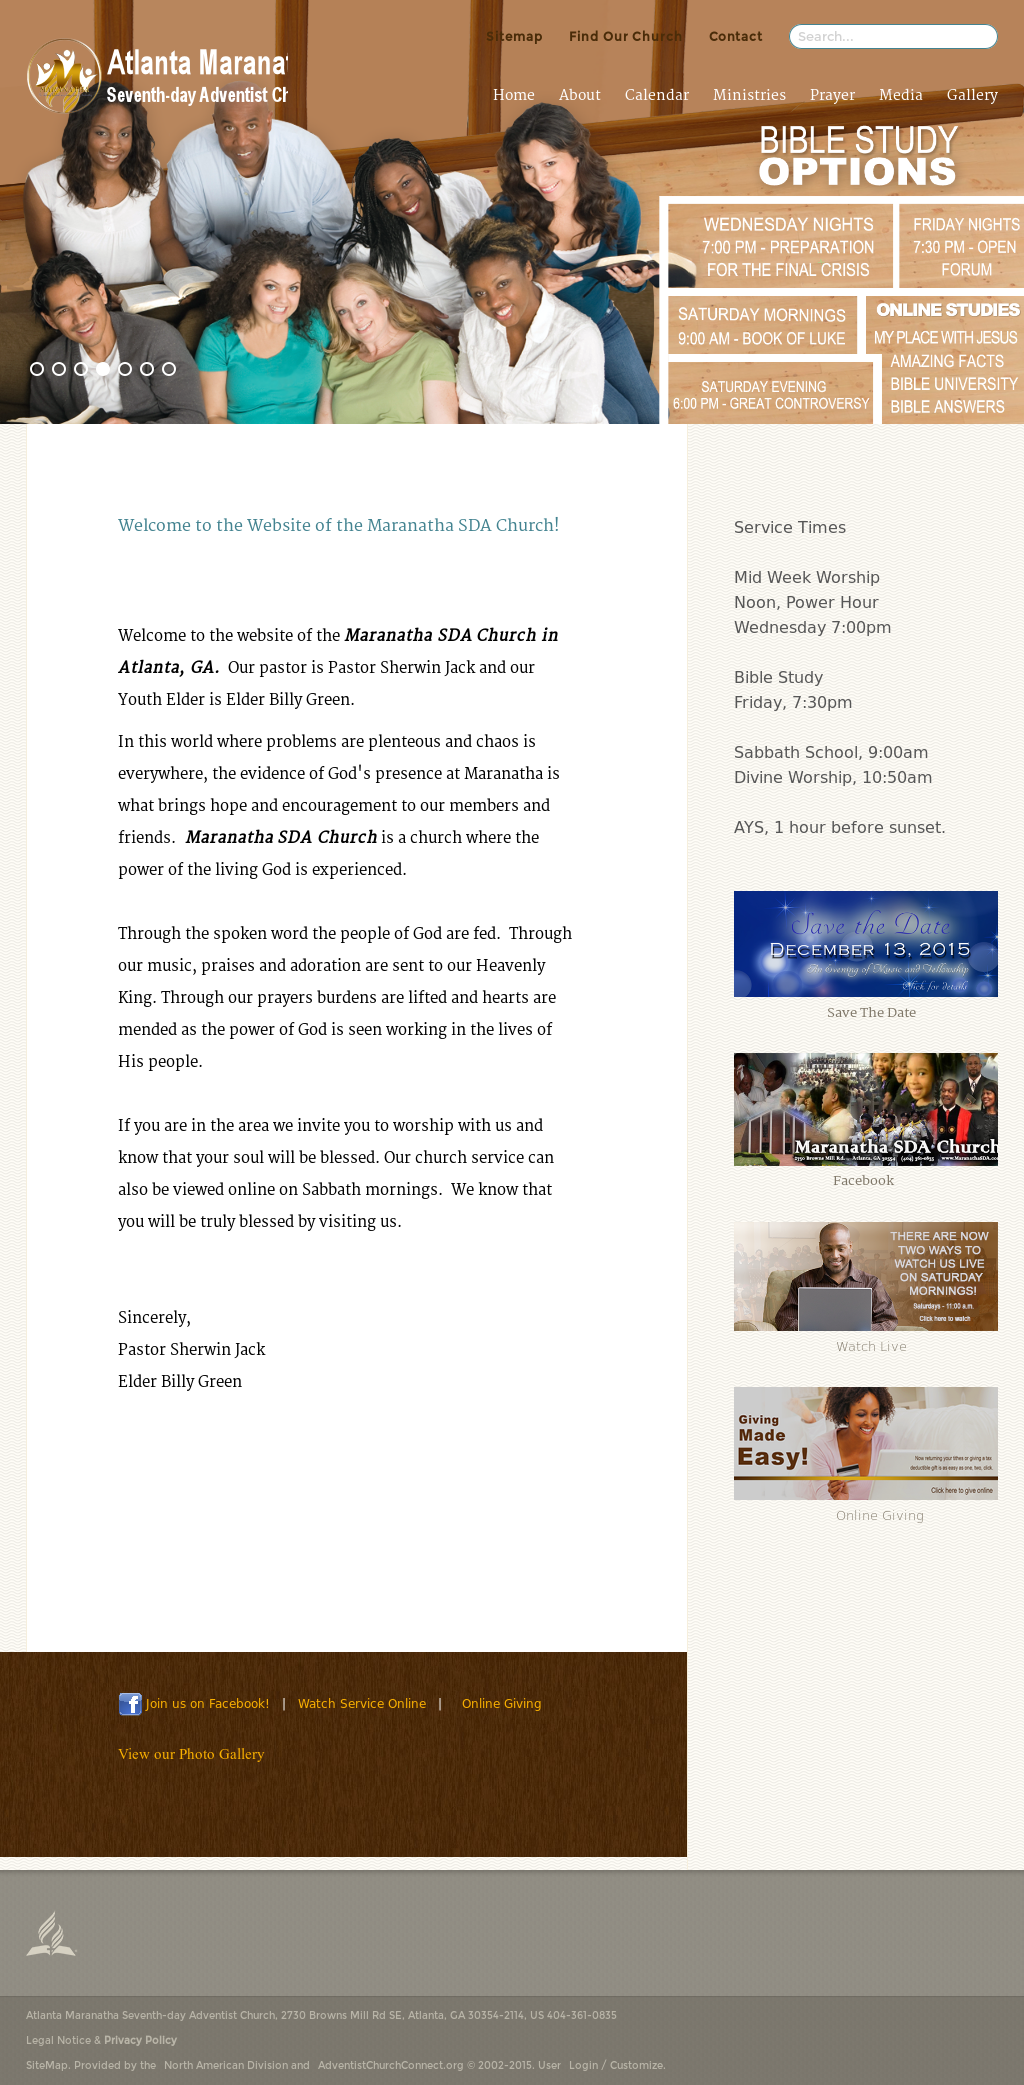 Atlanta Maranatha Sda Church Competitors, Revenue and